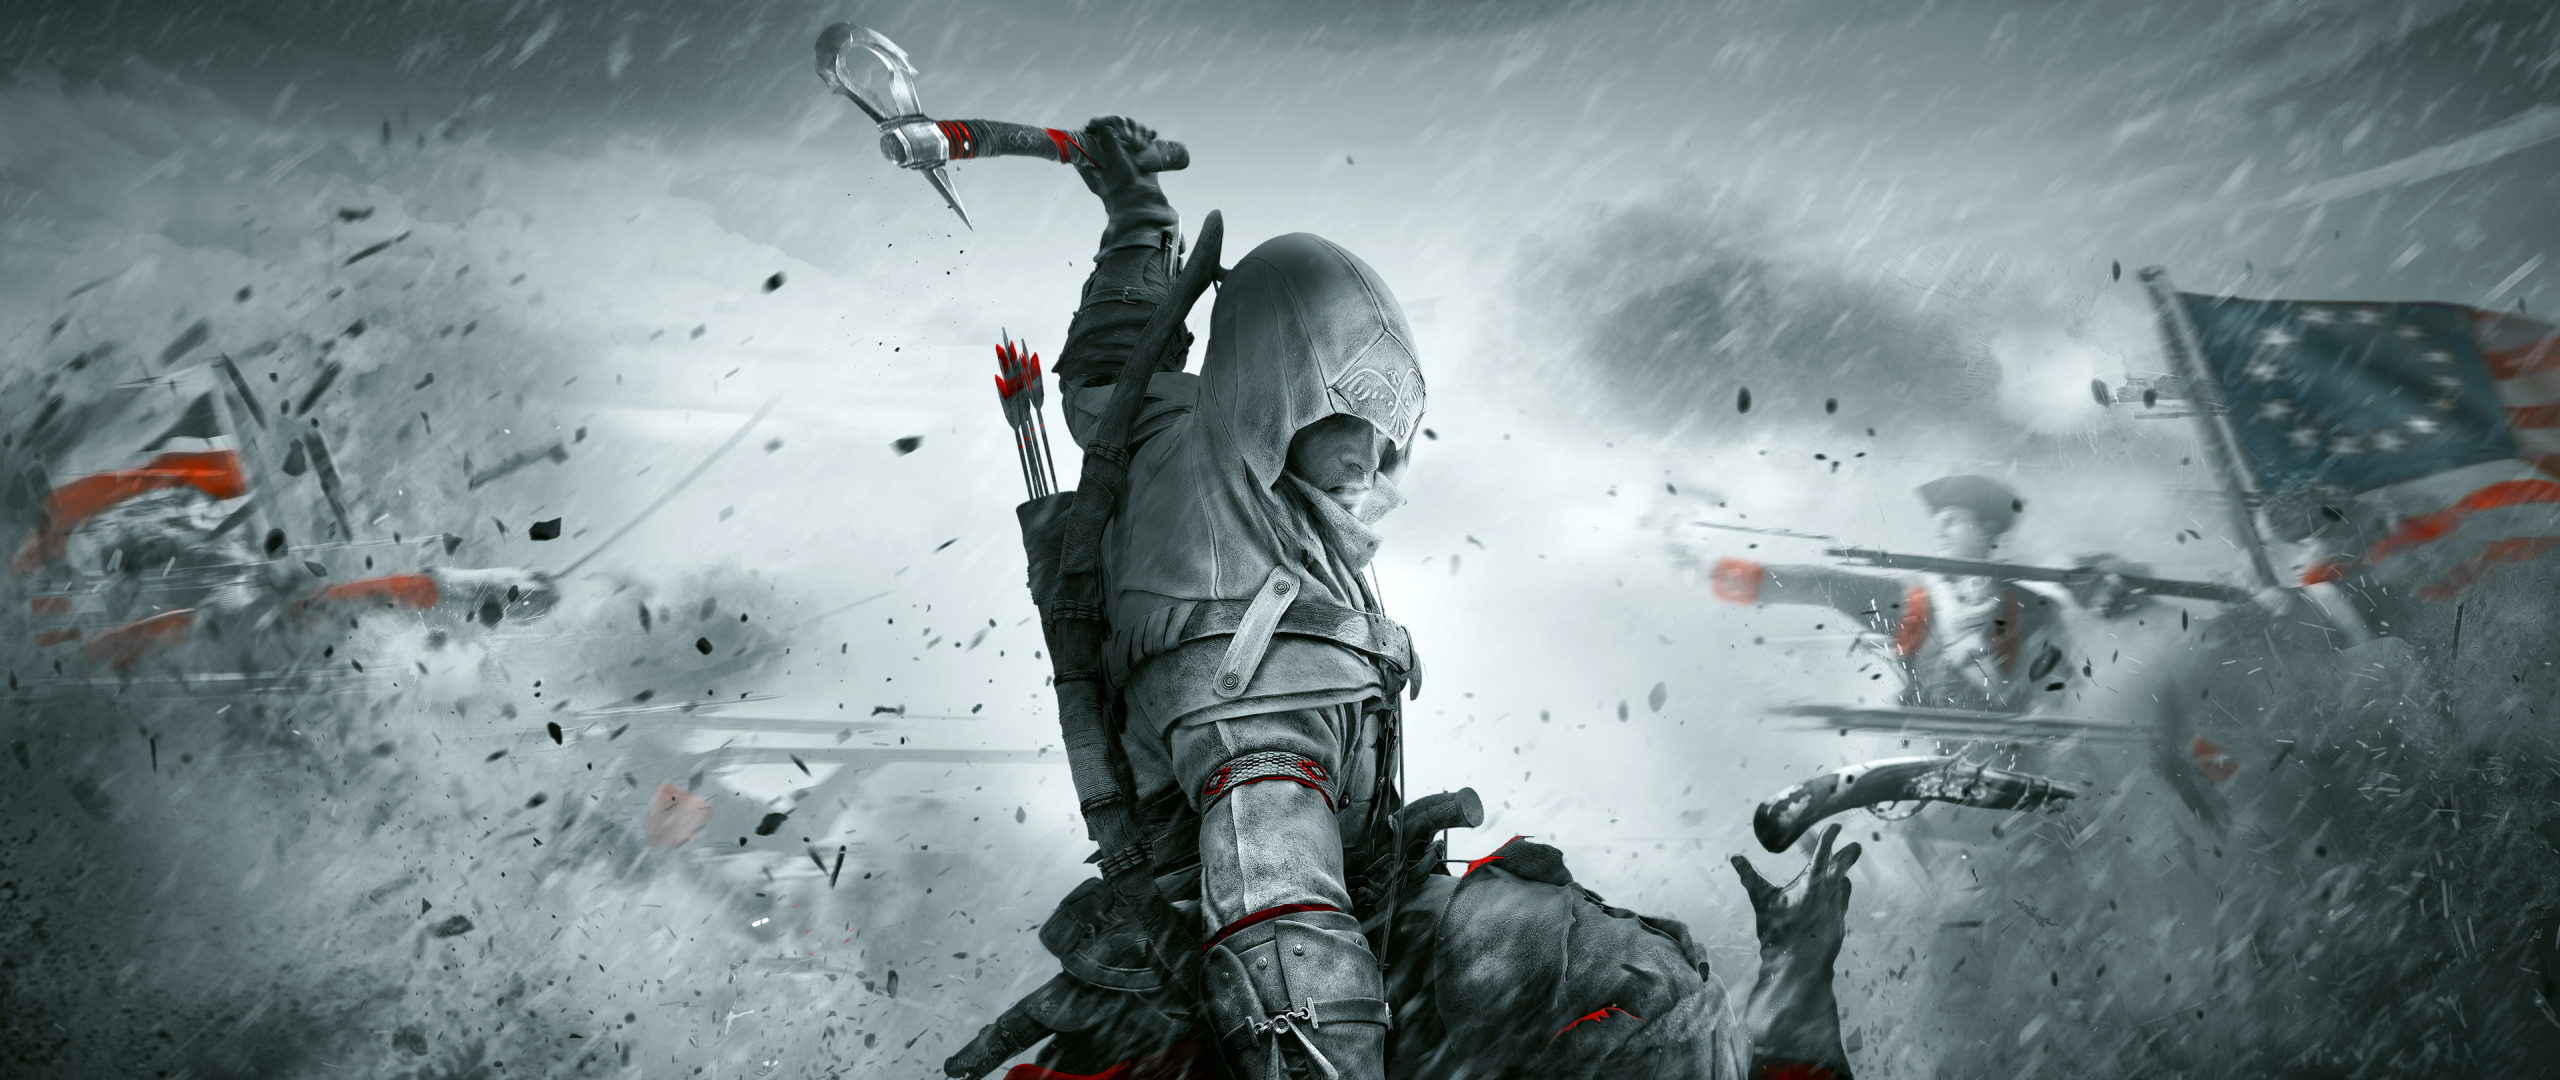 Assassin S Creed Wallpaper 4k 2560x1080 Wallpaper Teahub Io